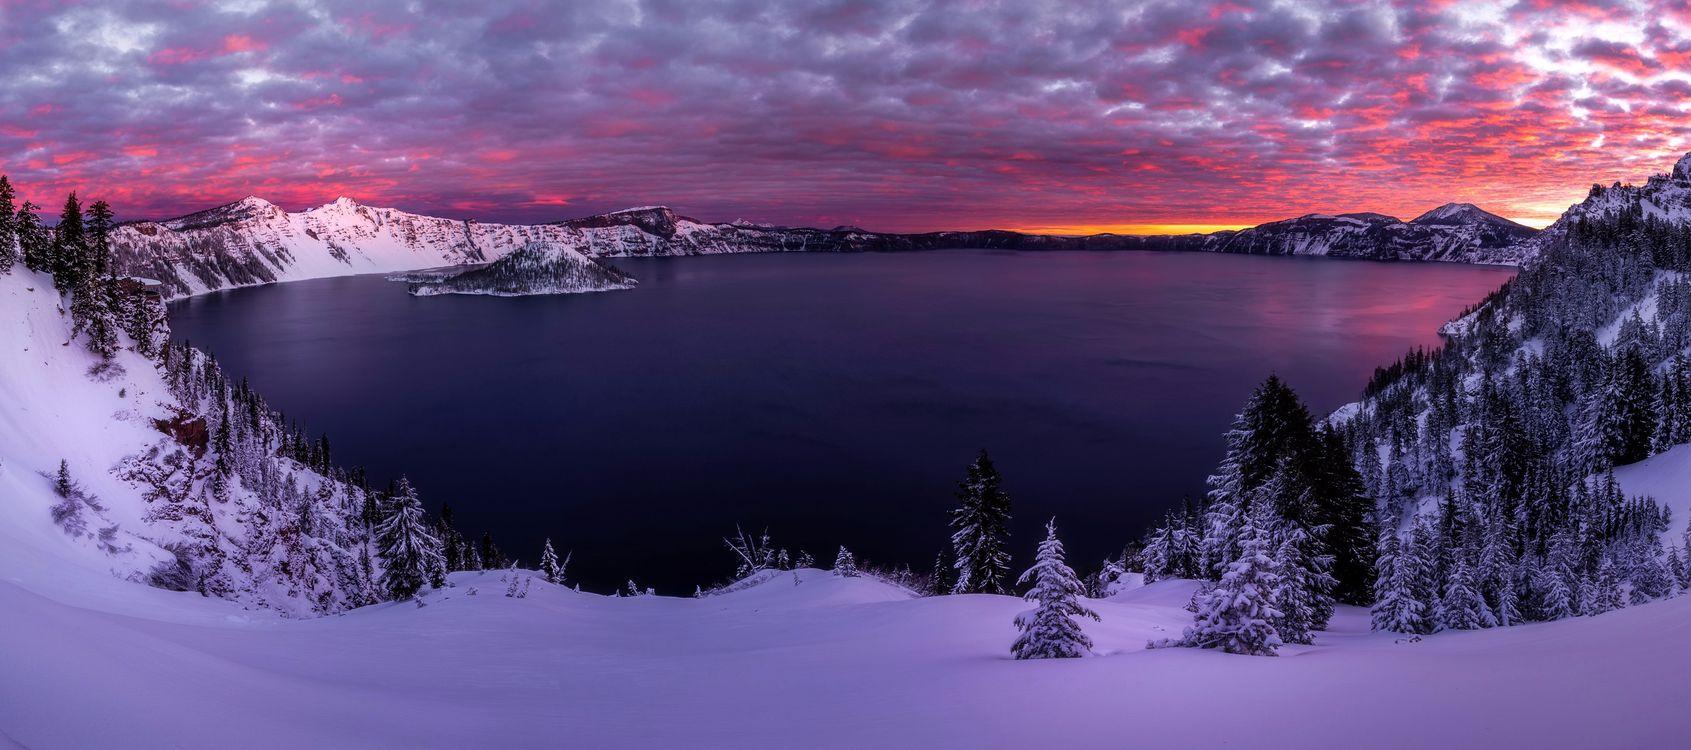 Обои Crater Lake, Southern Oregon, Crater Lake National Park картинки на телефон